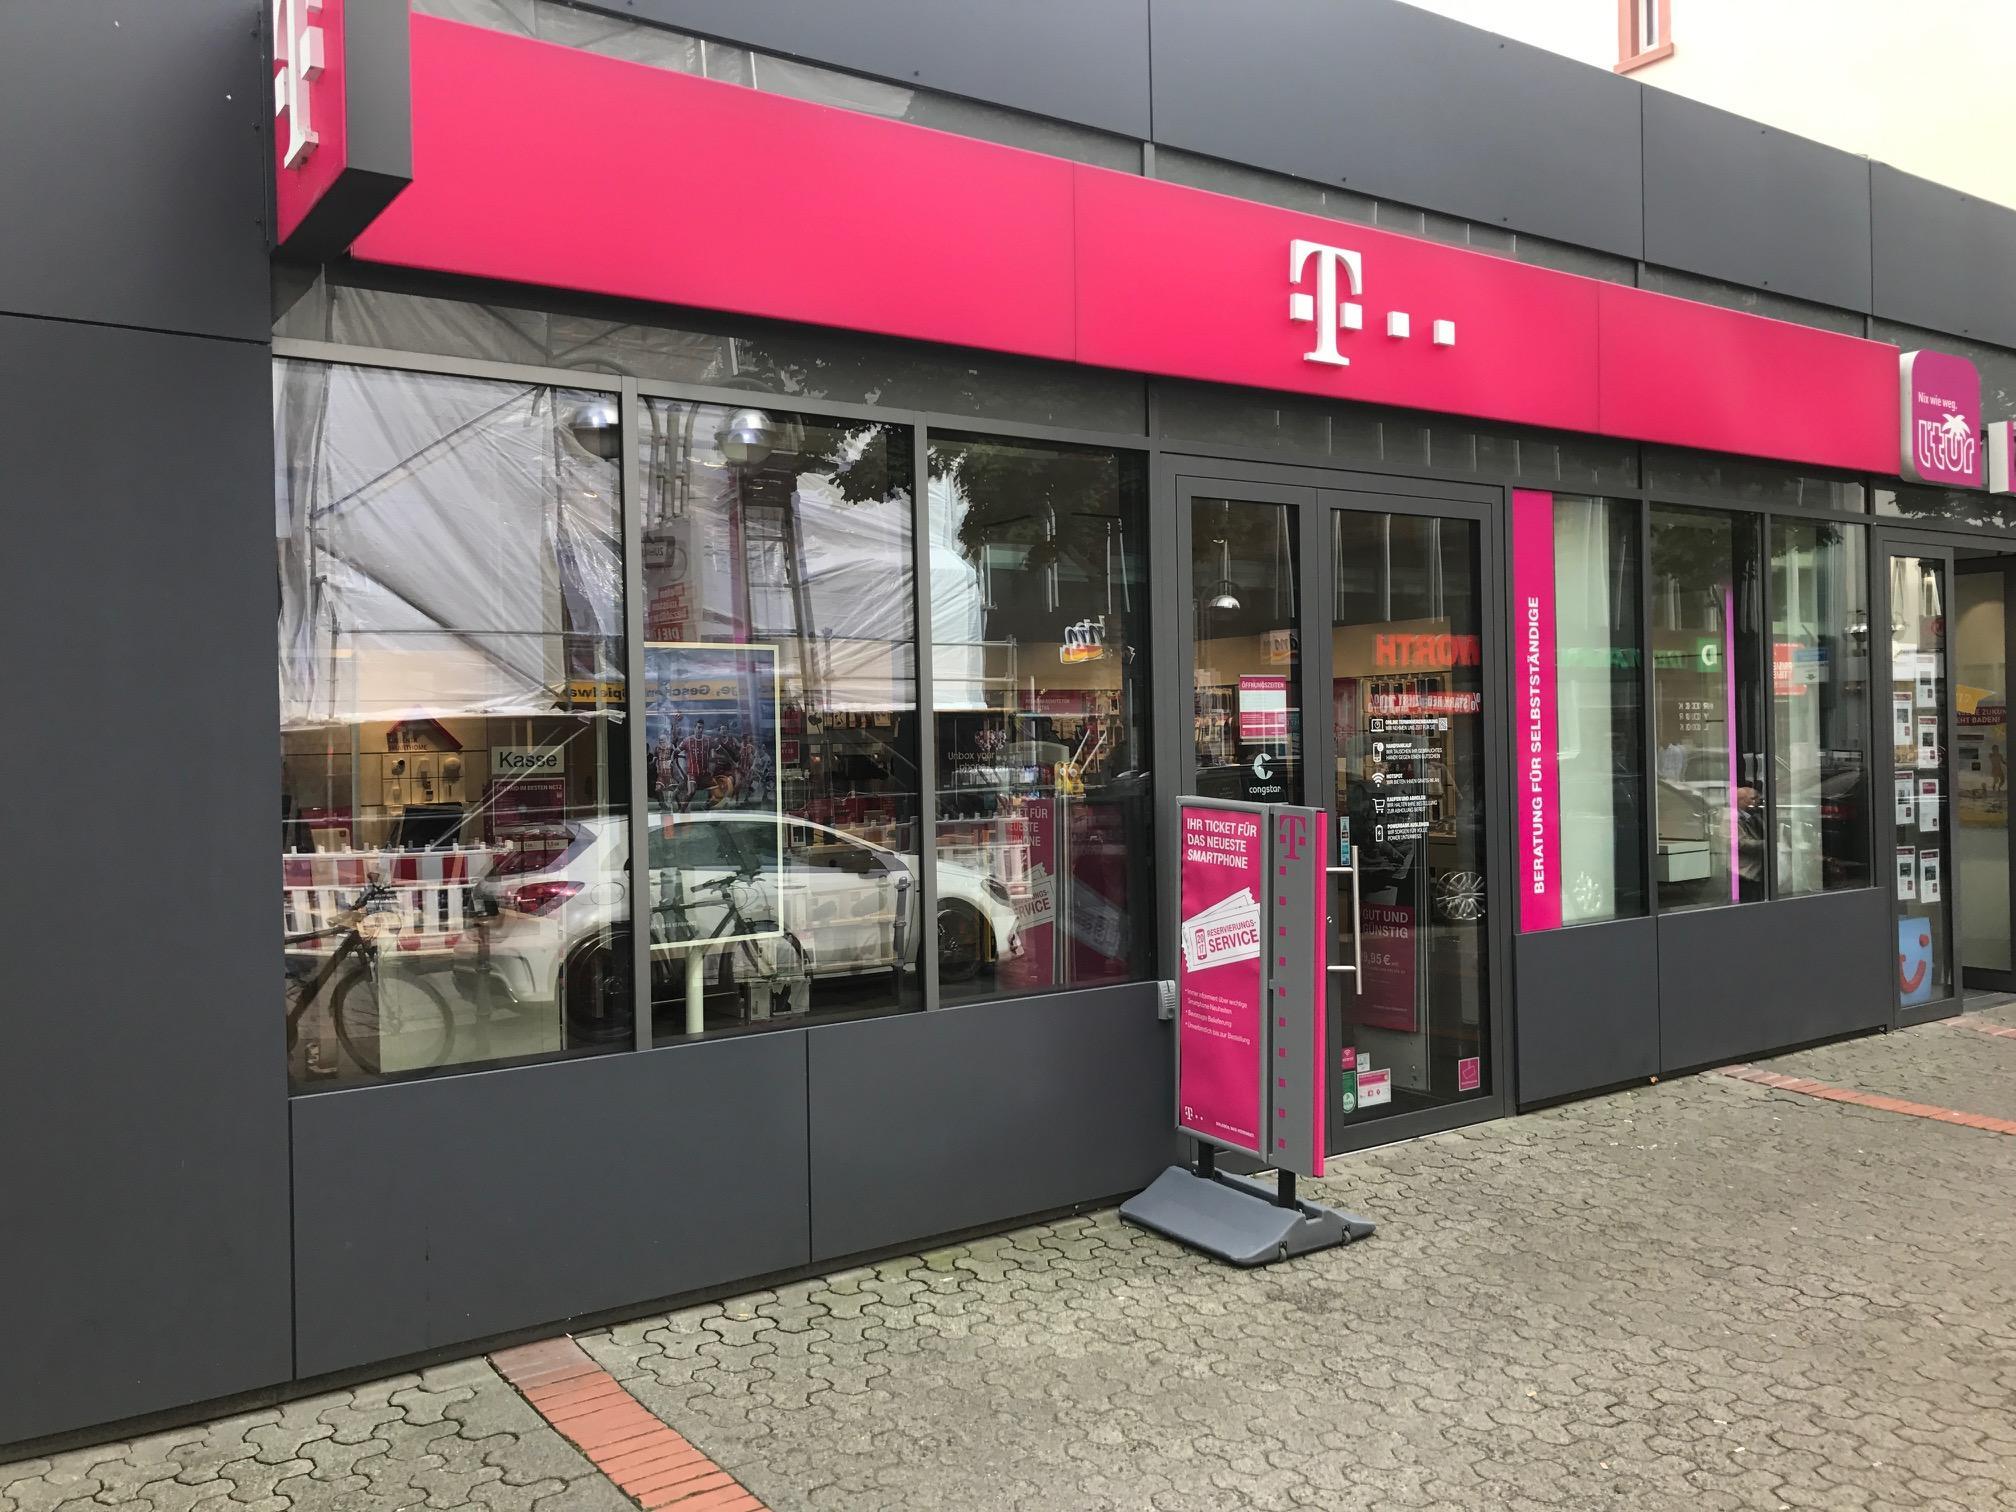 Telekom Shop - Geschlossen, Berger Str. 162 in Frankfurt